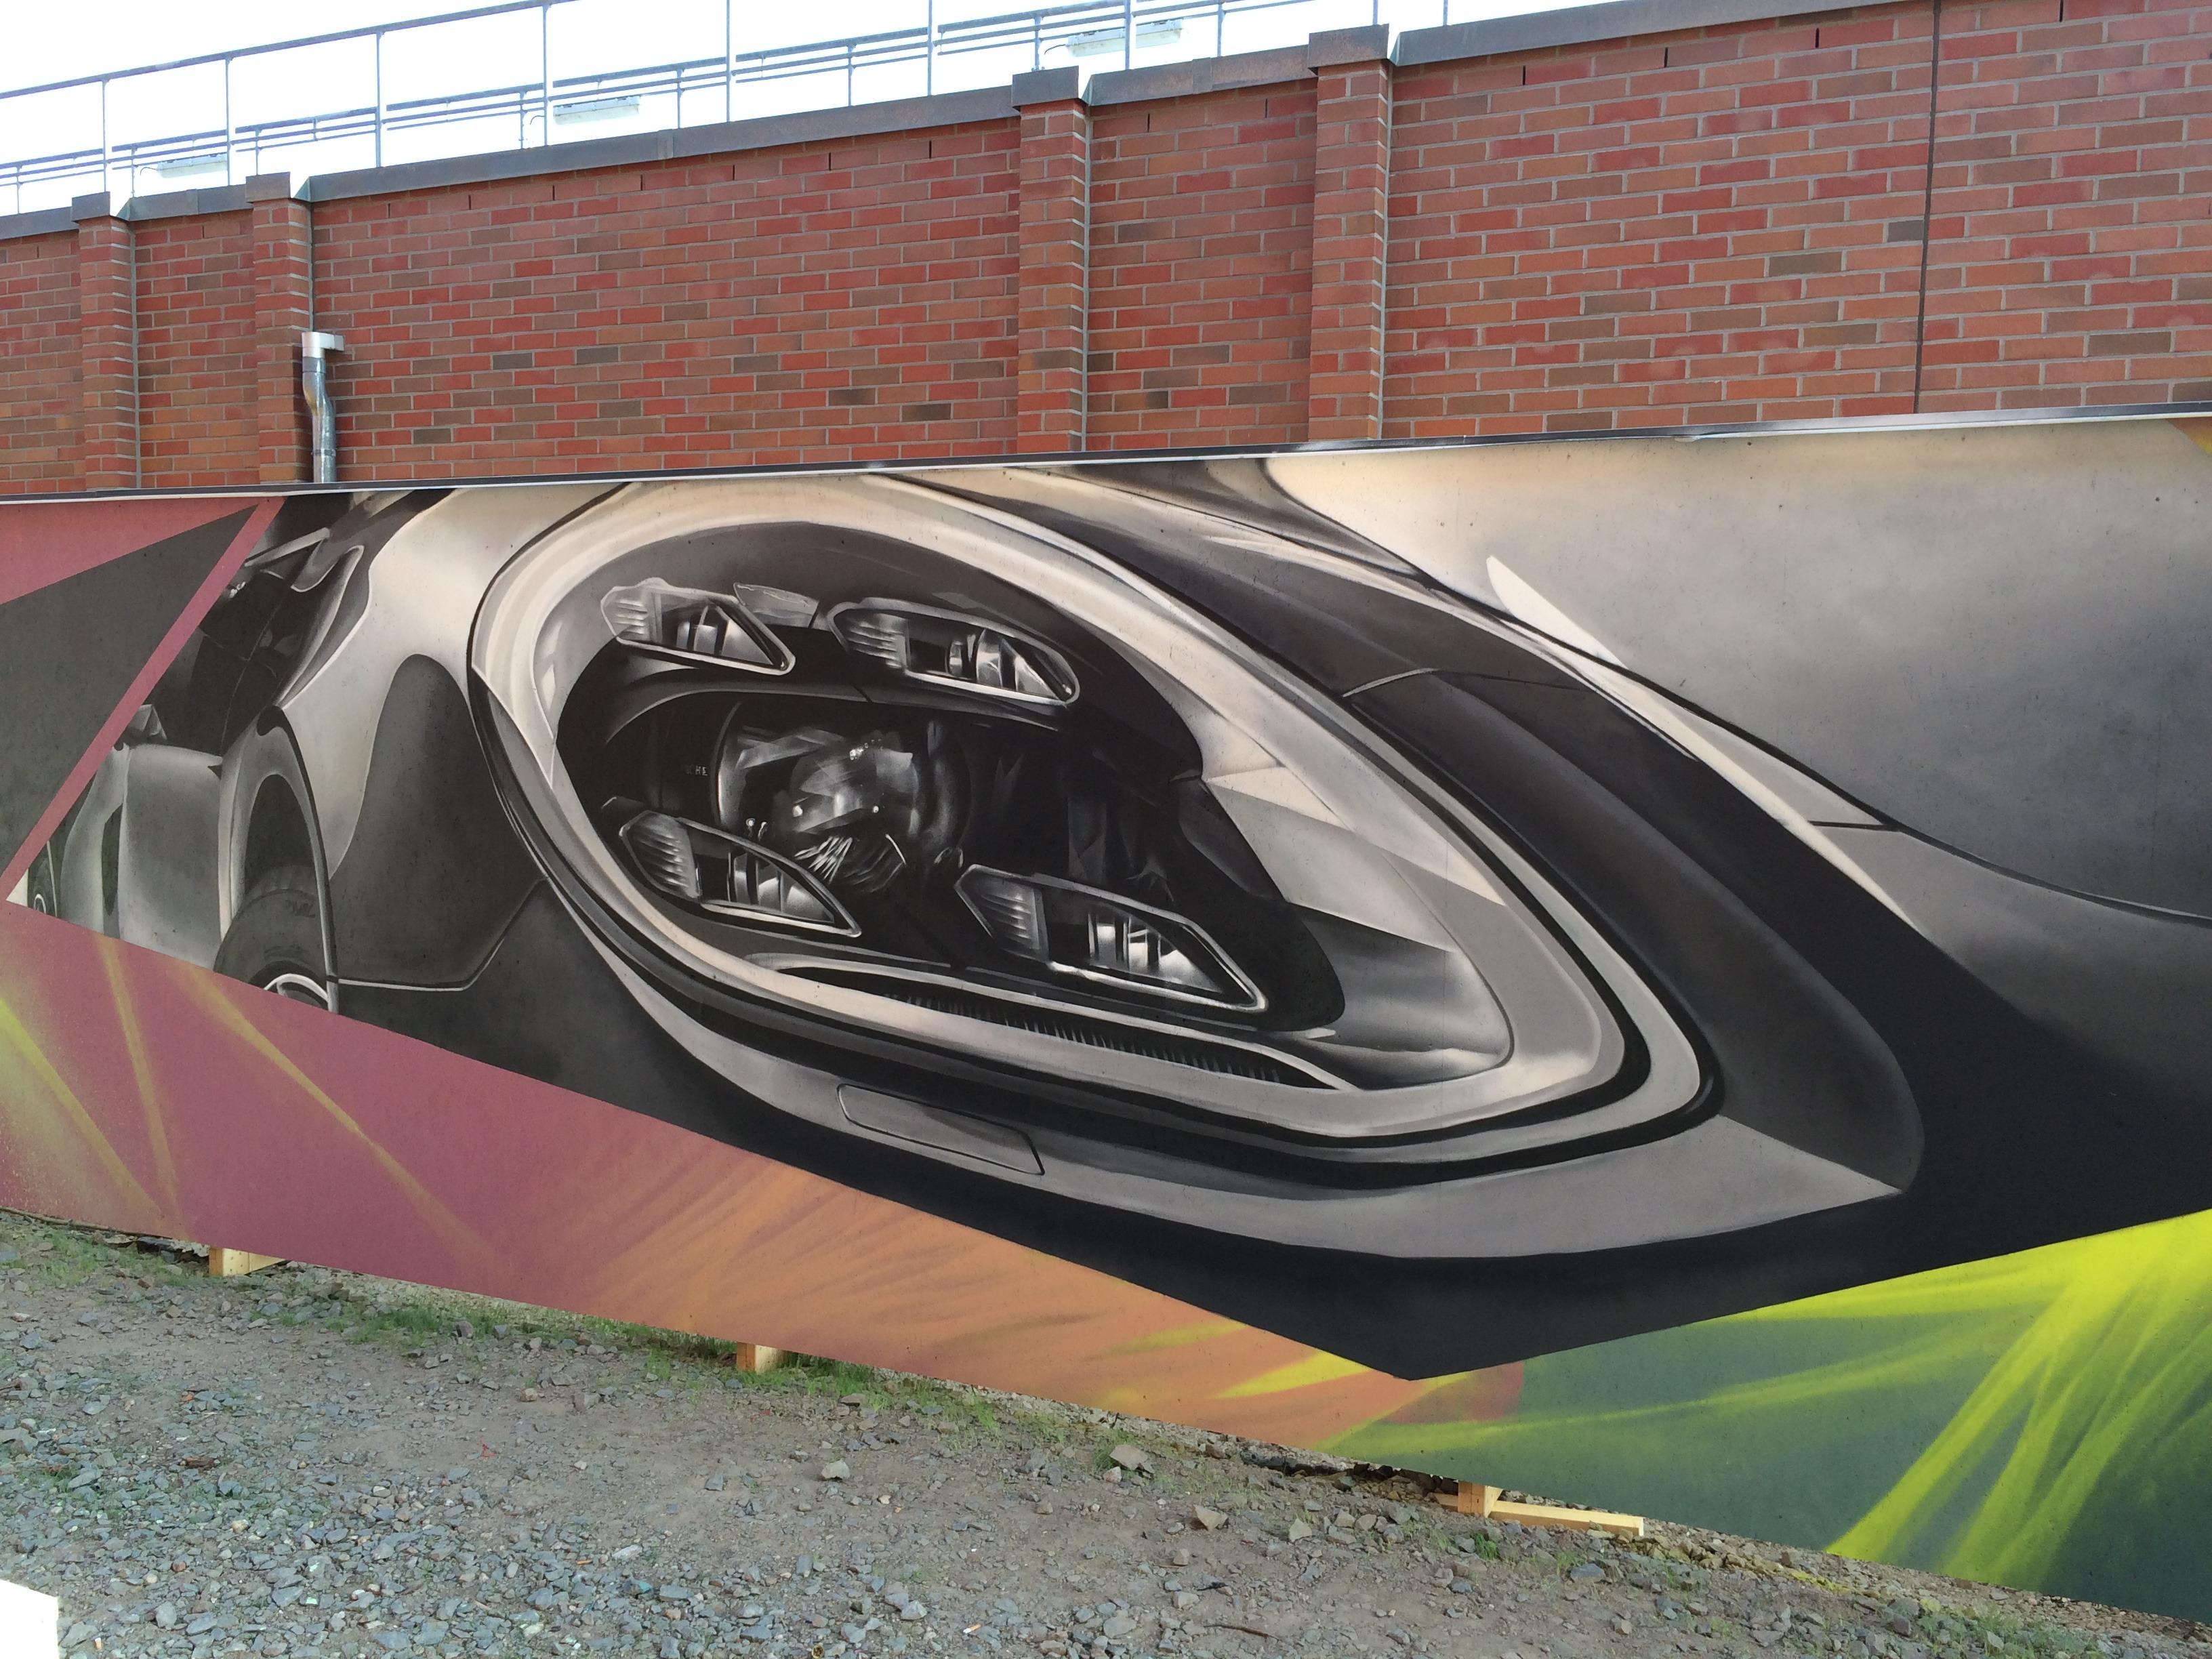 Graffitikuenstler, Graffitiauftrag, Artmos4, Porsche, Leipzig, Graffiti, Fotorealistisch